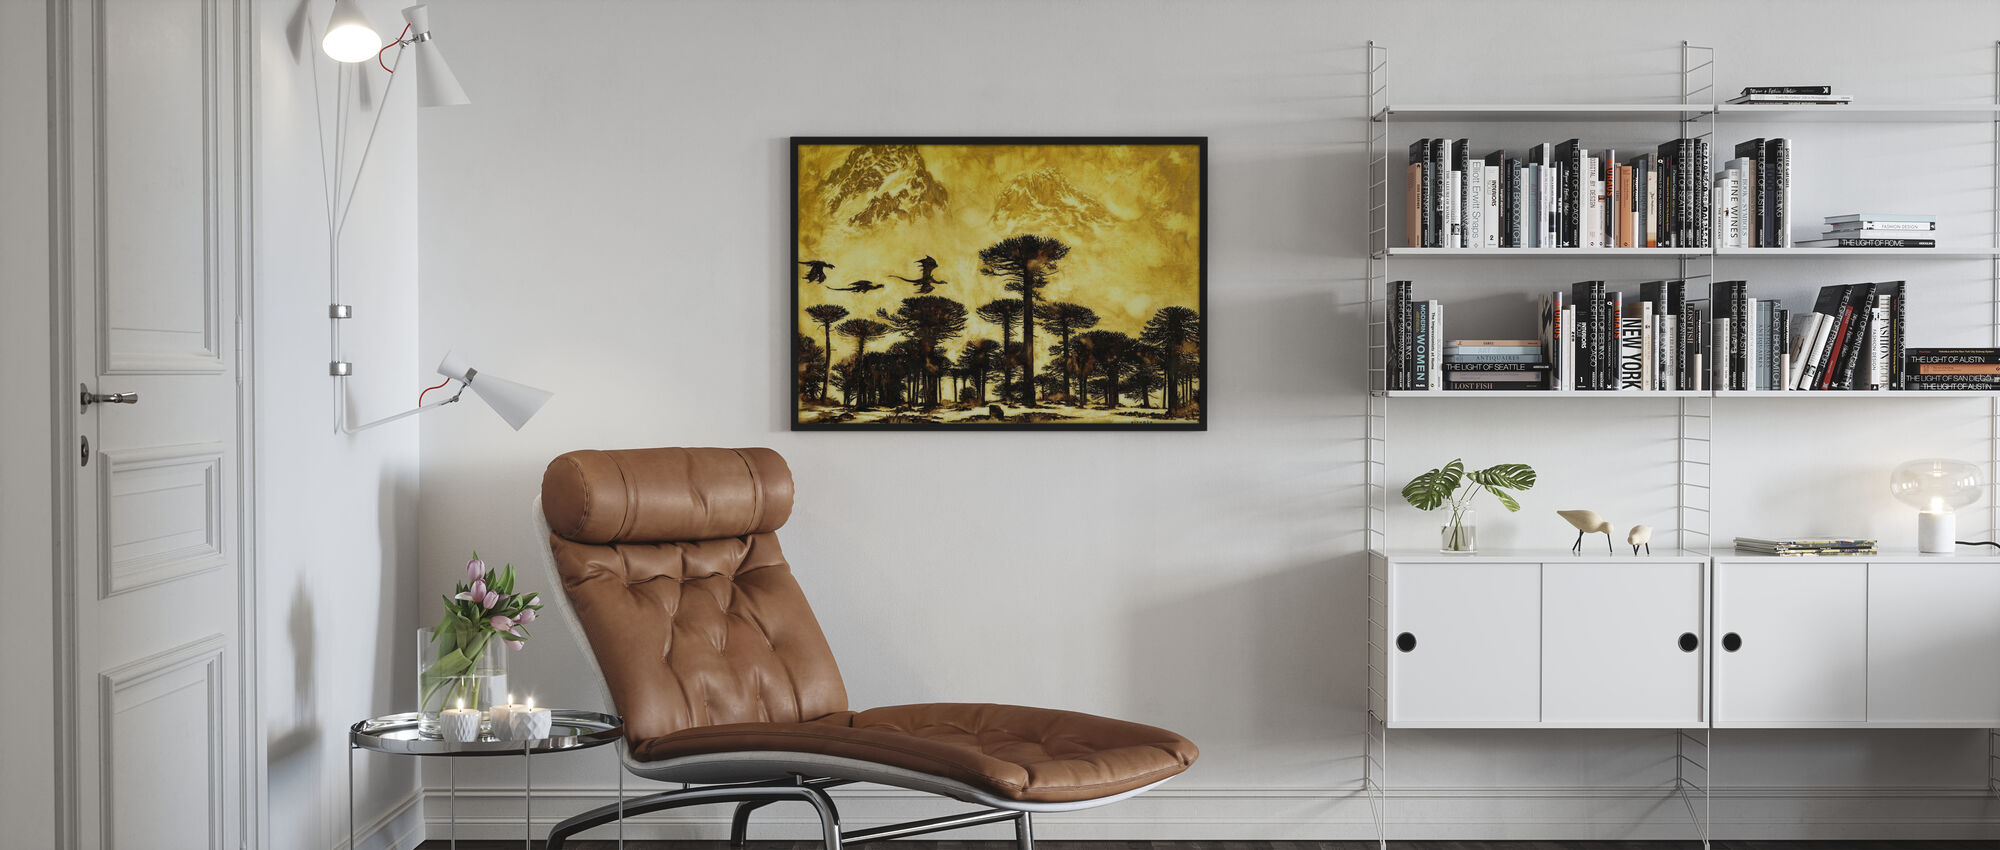 Persec - Framed print - Living Room